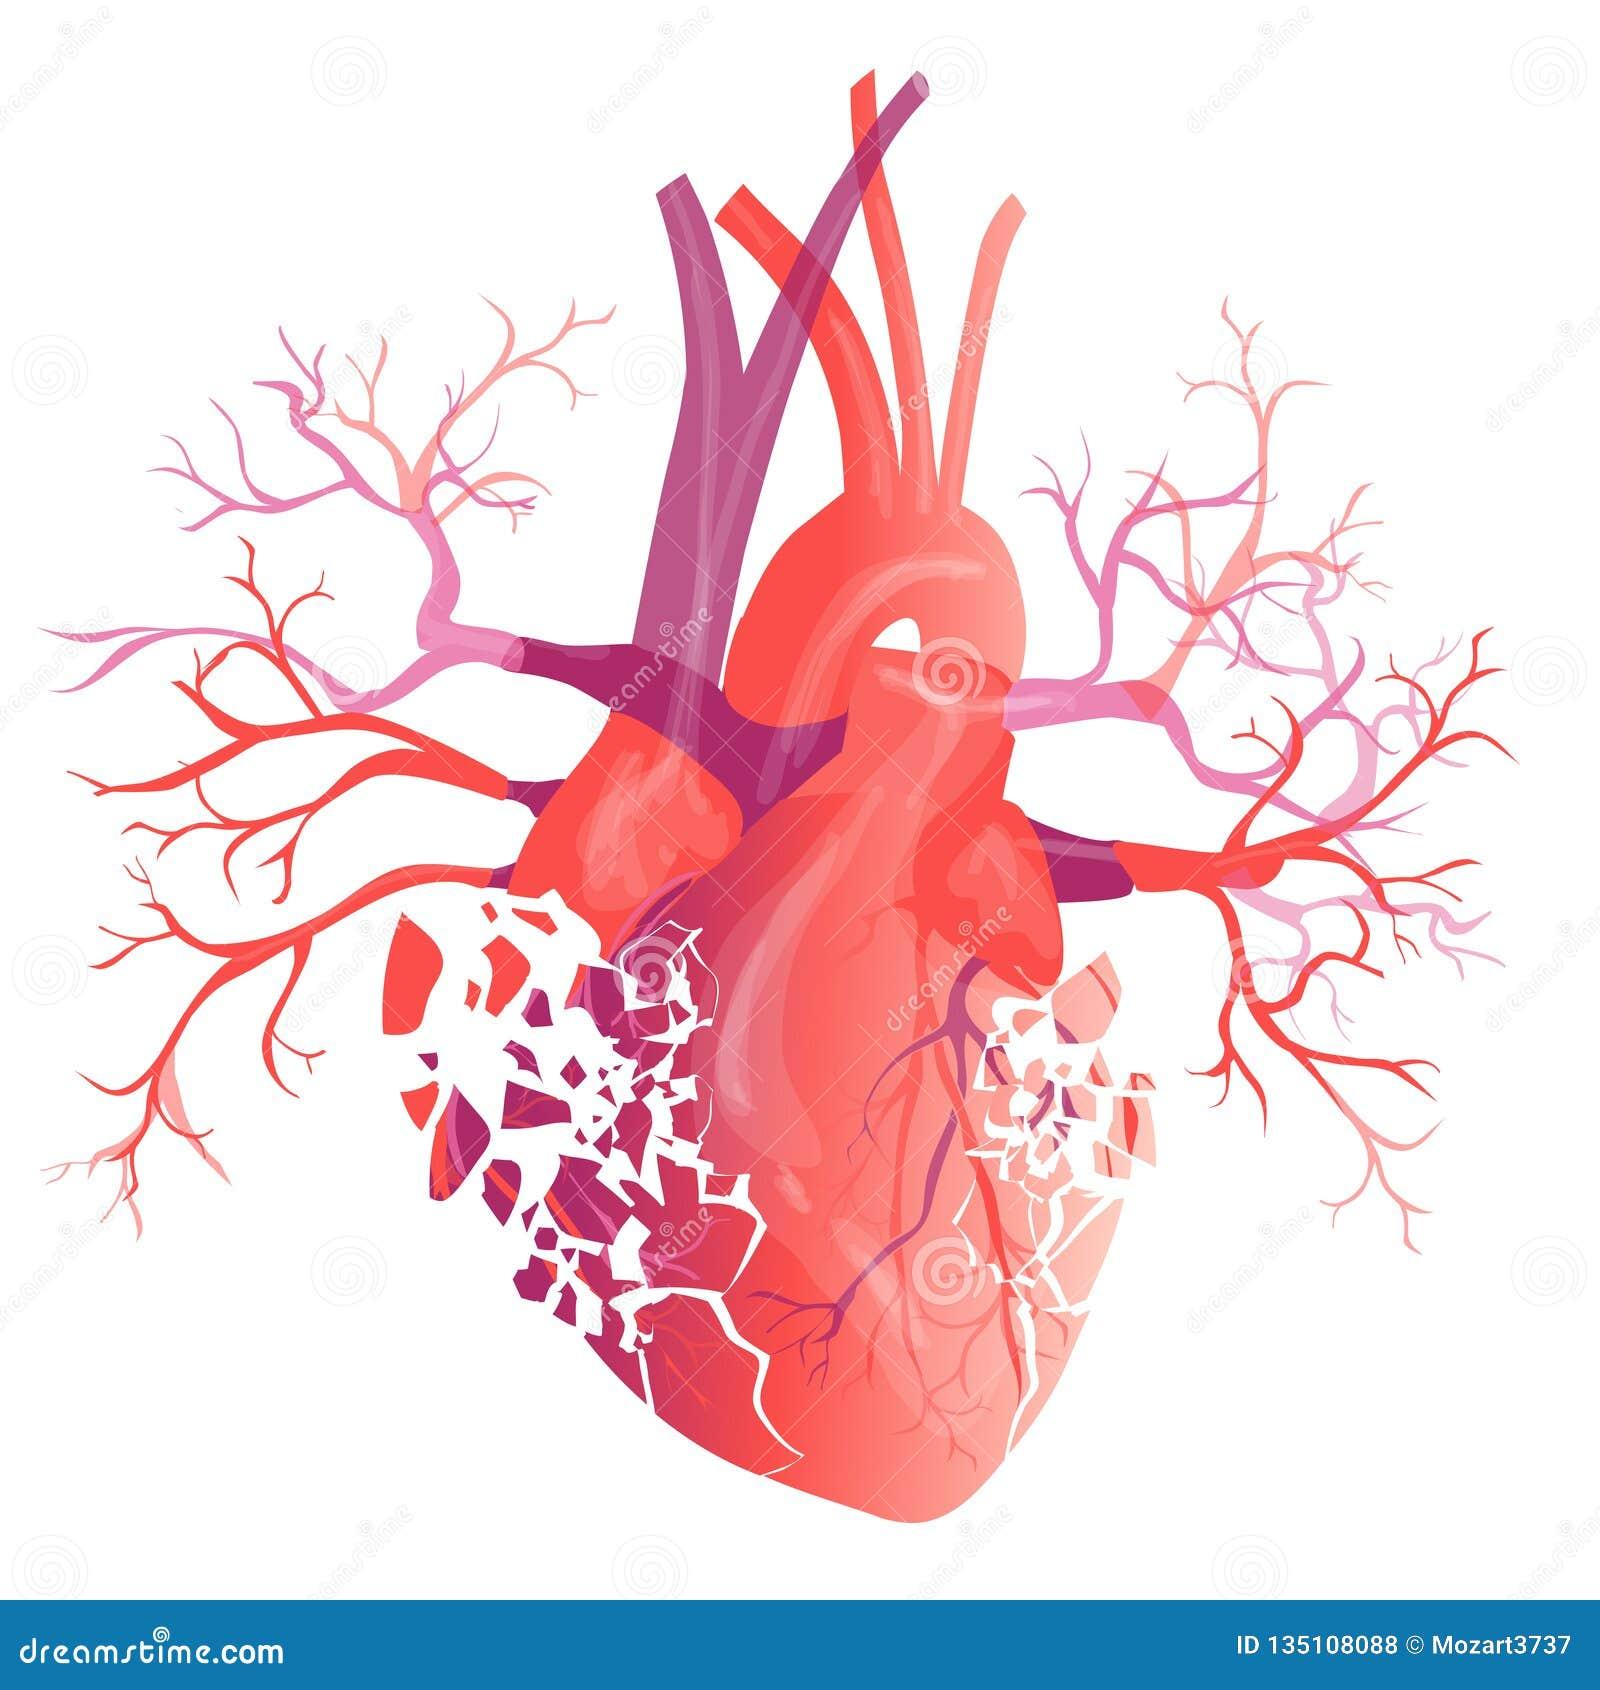 Vector Realistic Human Heart Anatomy Concept Illustration Stock